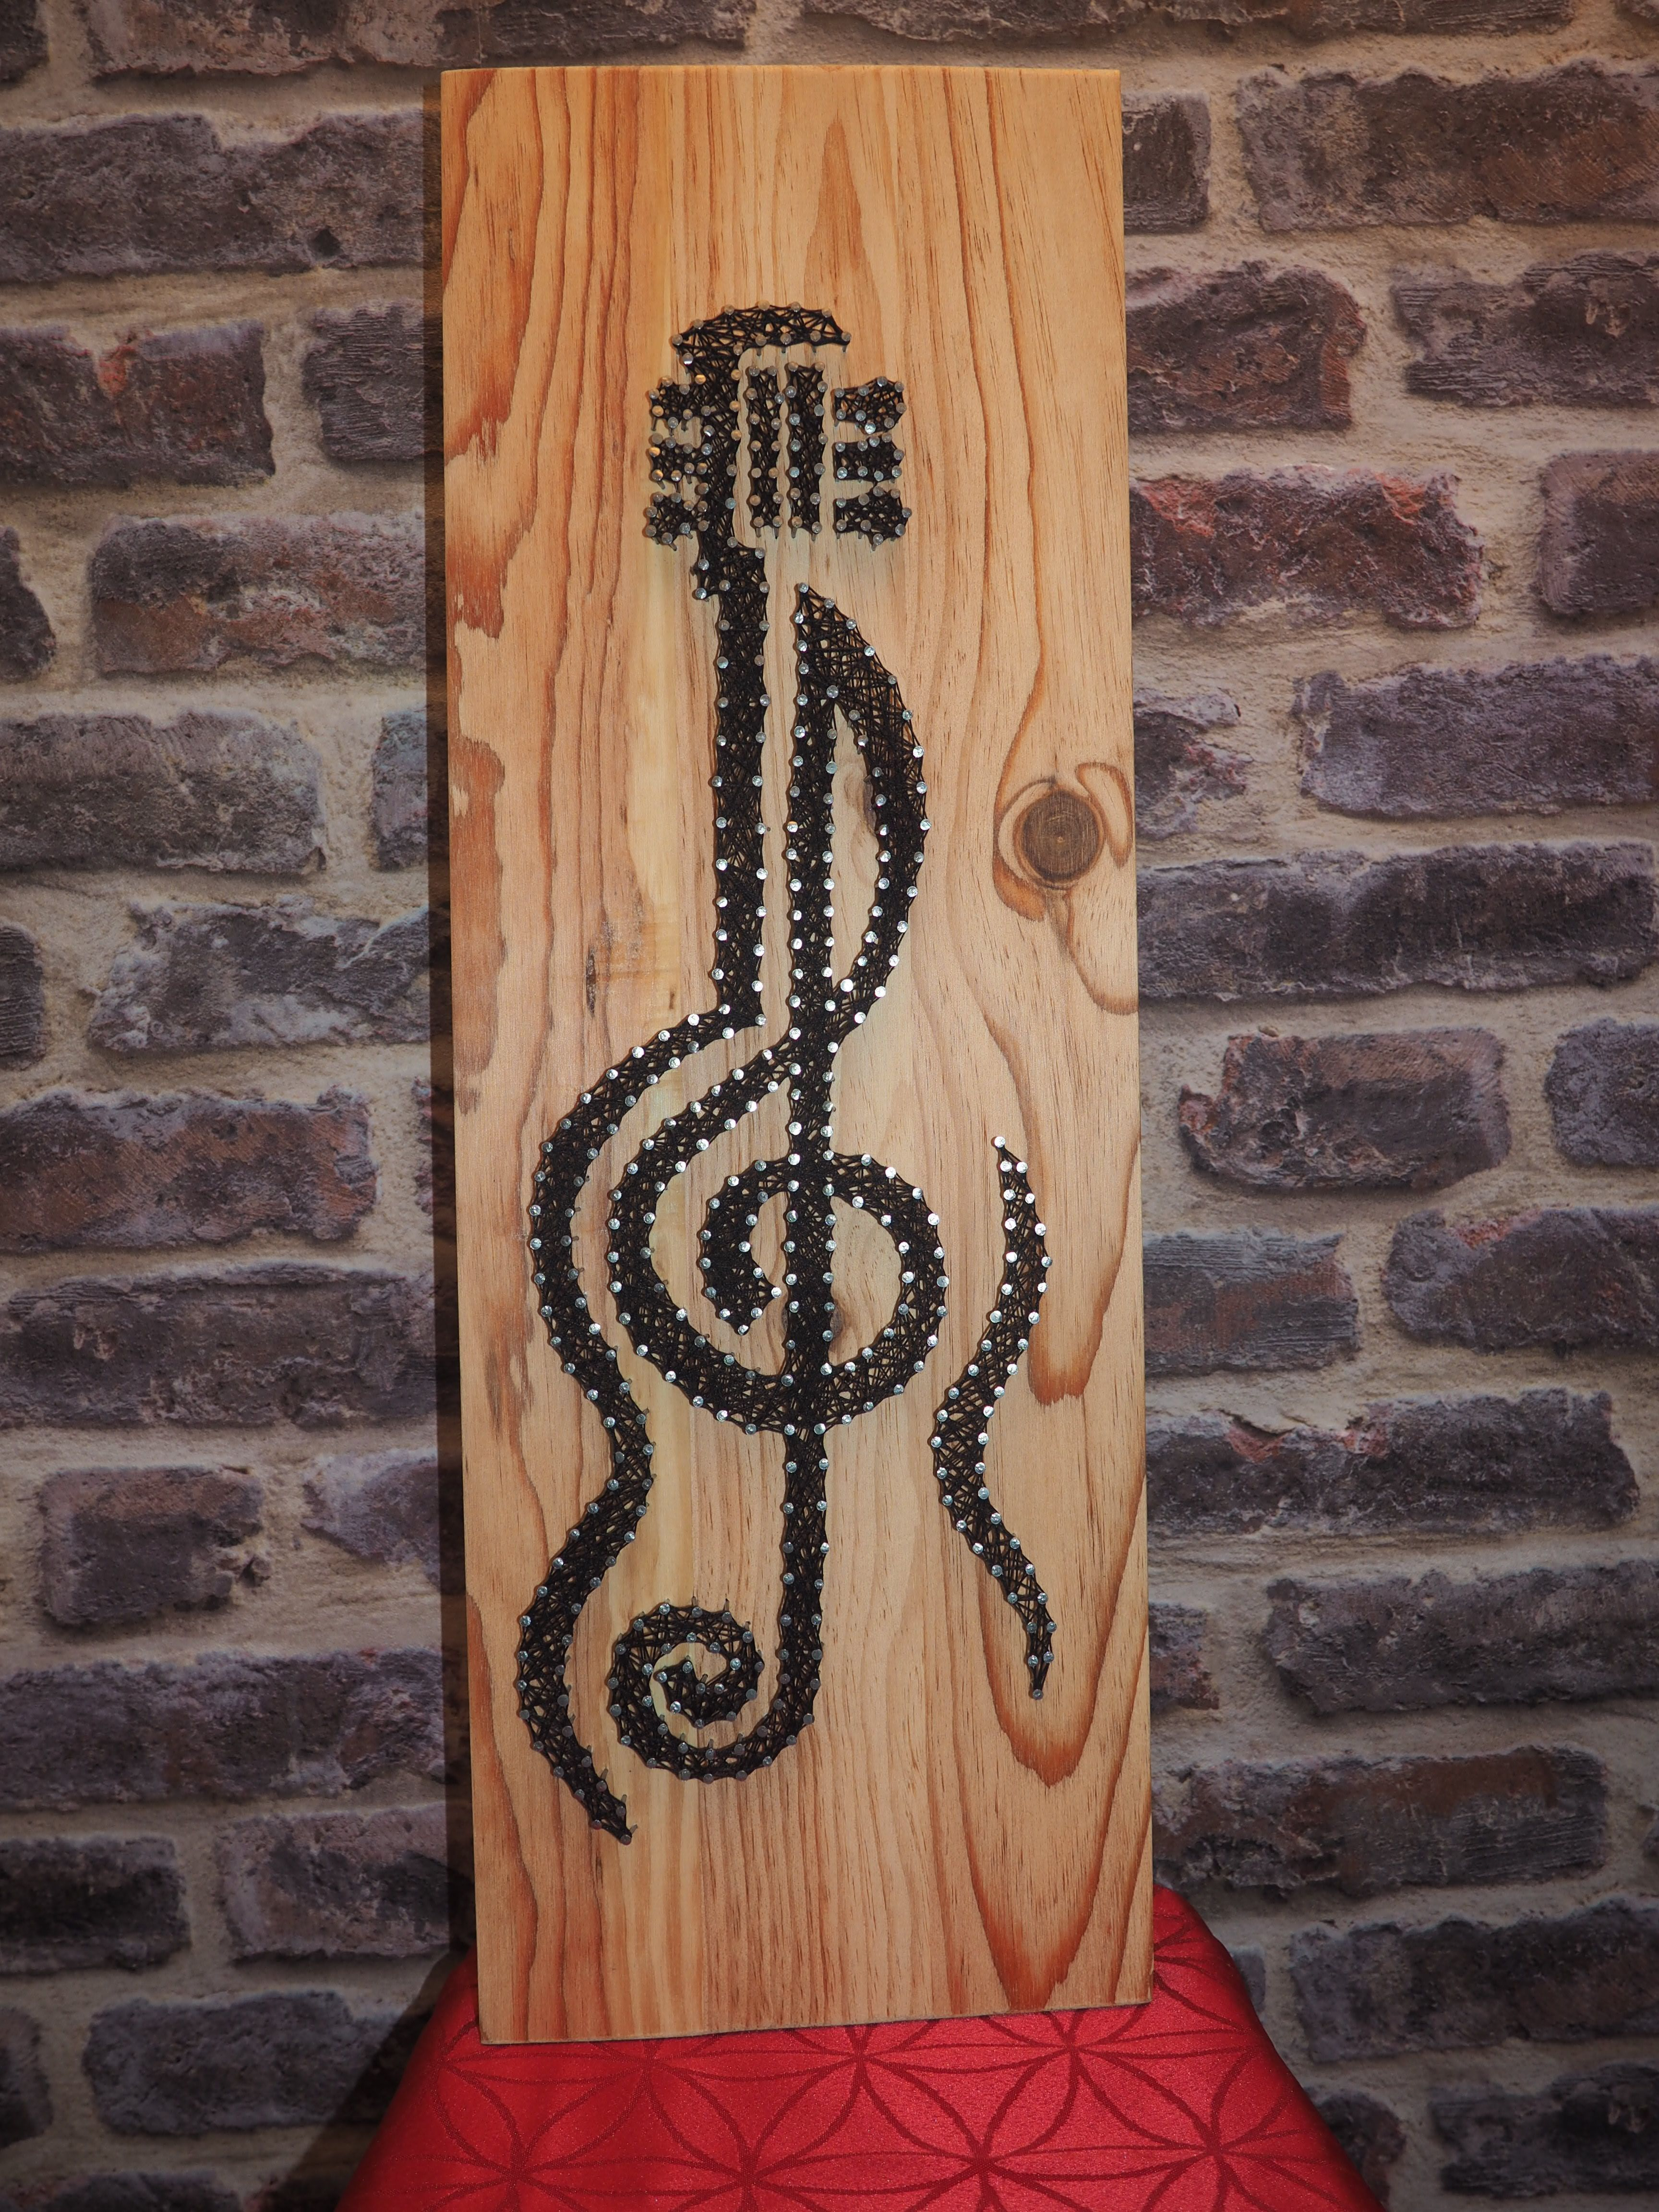 Pin de Peggy Burhans en String art | Pinterest | Hilo, Detalles para ...